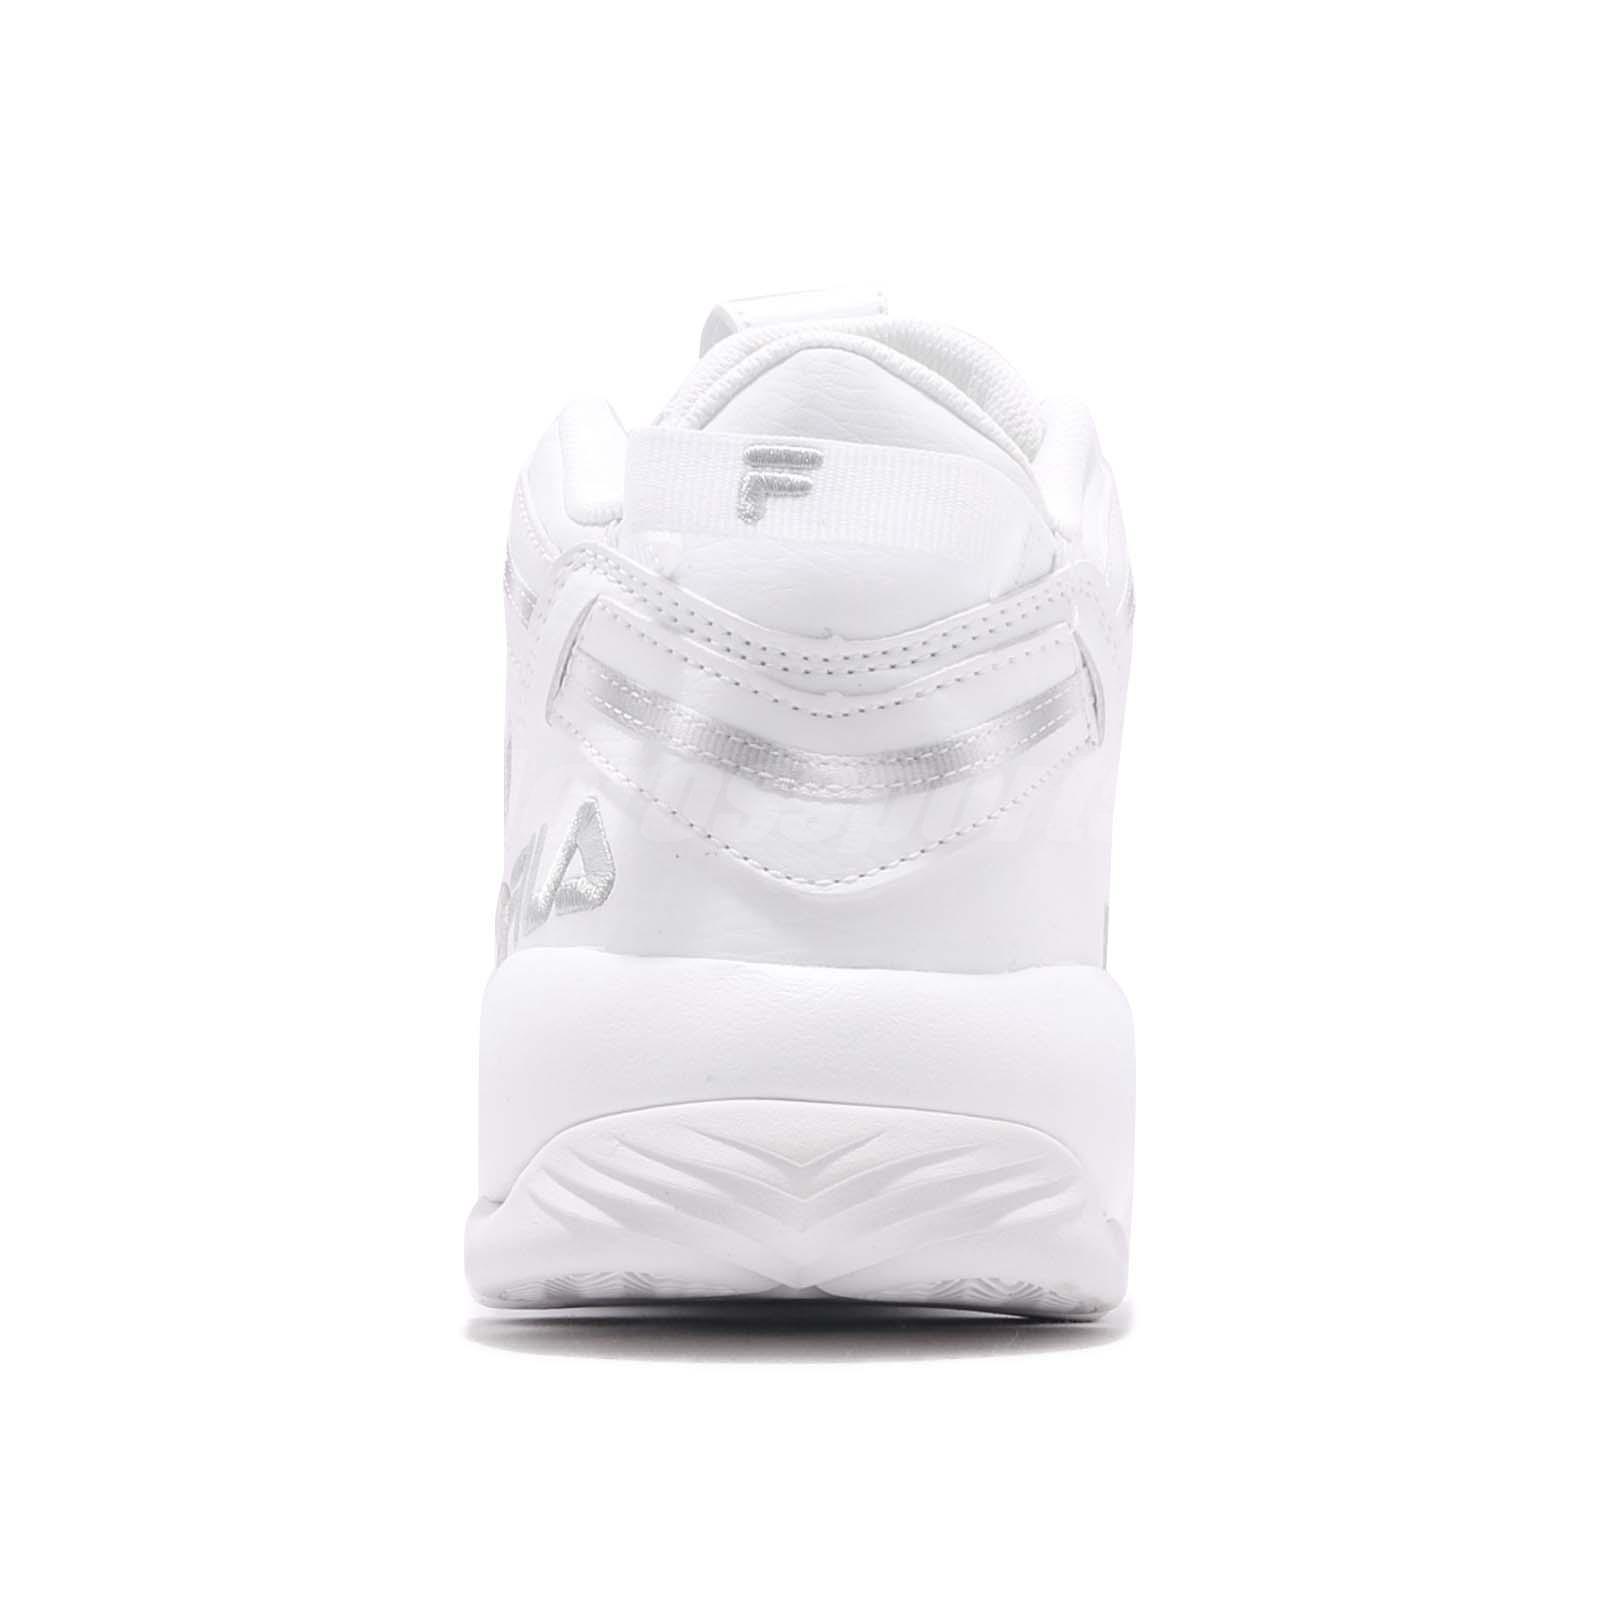 Fila Spaghetti 95 Jerry Stackhouse White Grey Men Basketball Shoes ... 92eb68f08